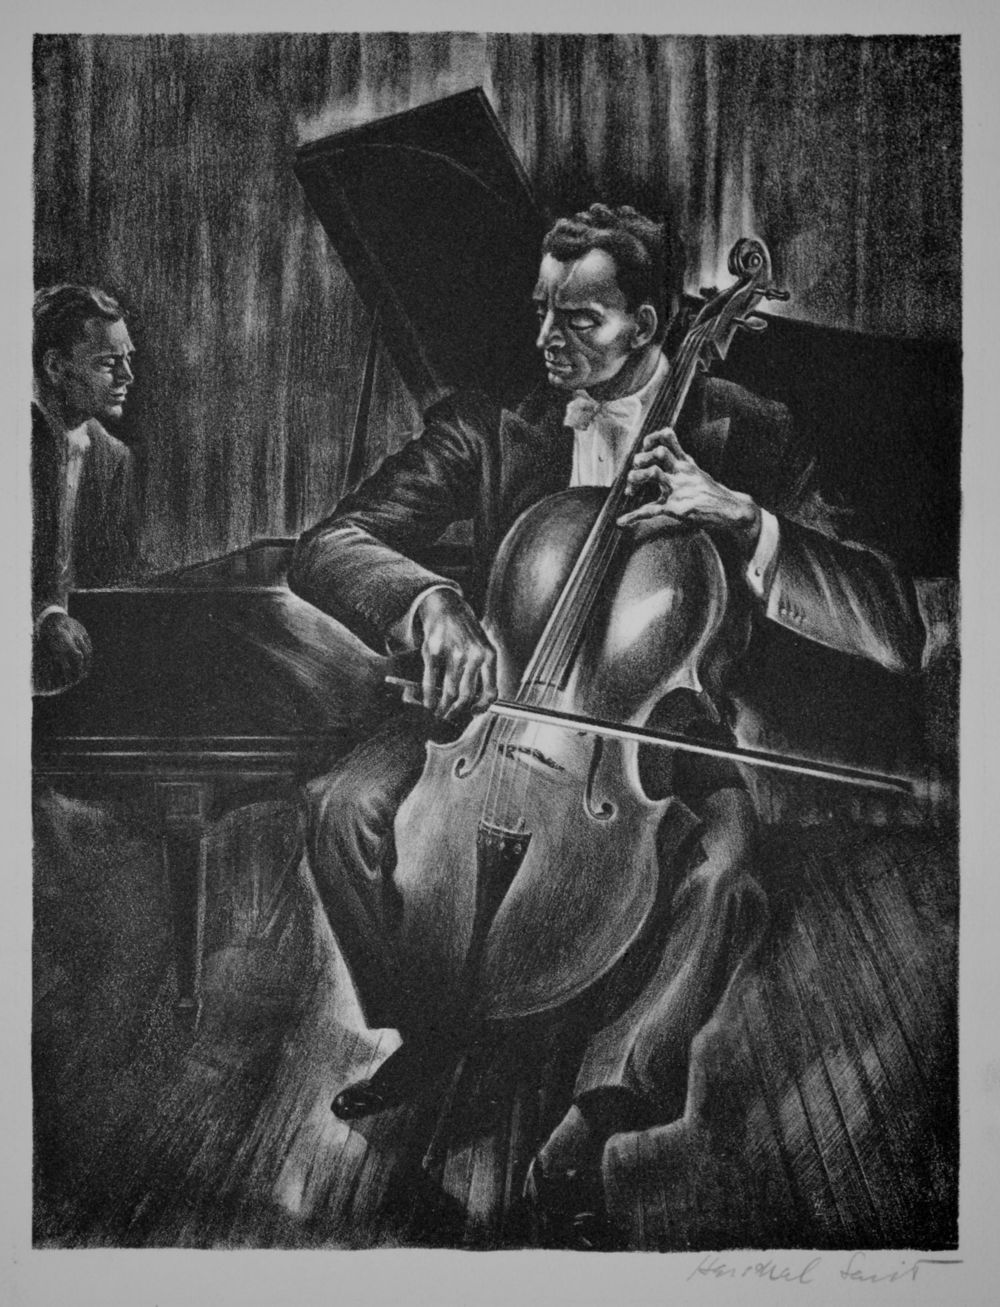 Levit - Cellist.jpg